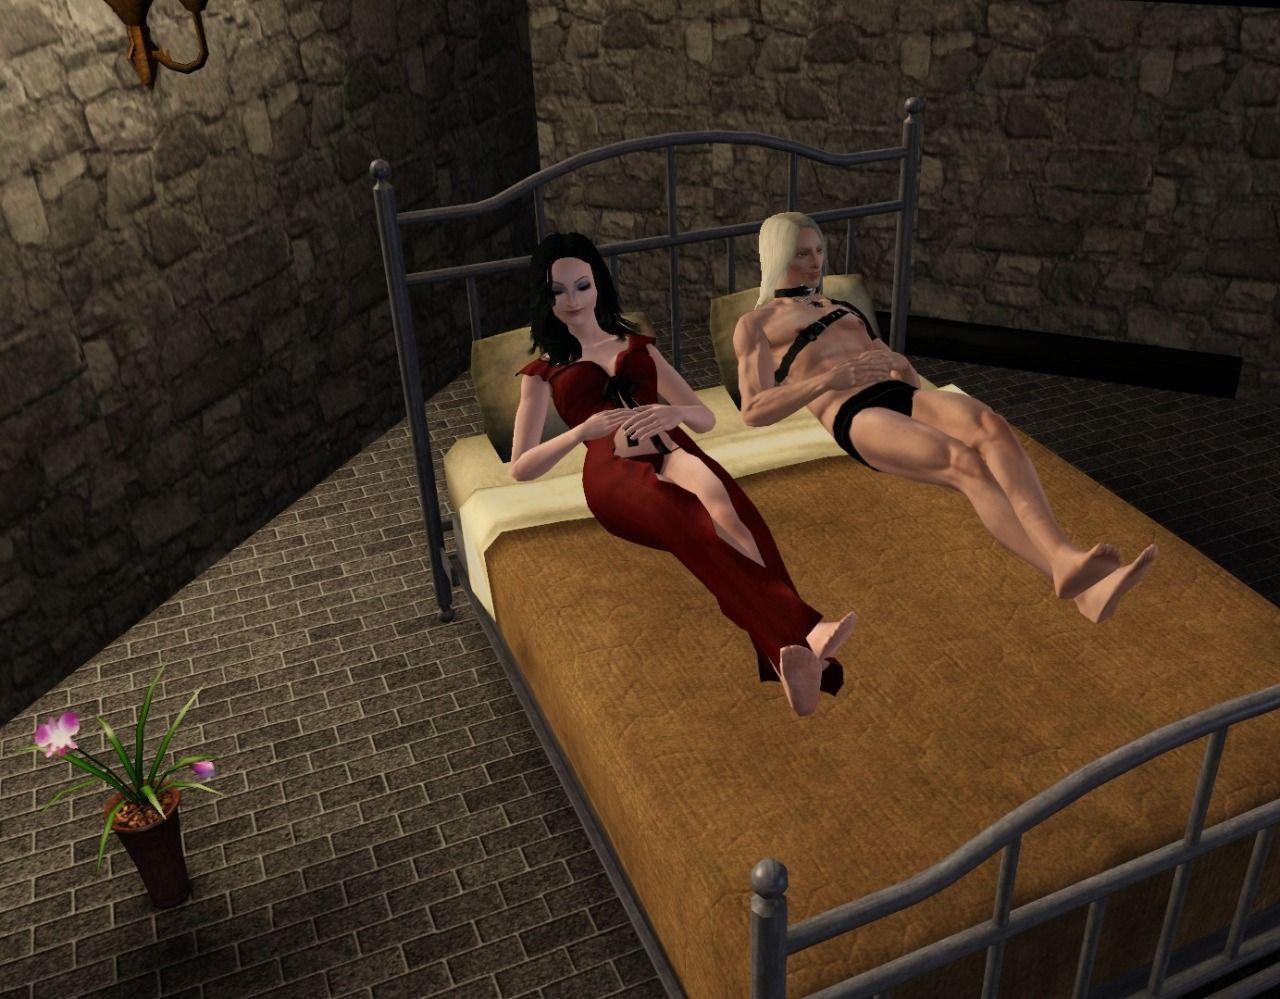 Sims 4 sex animation mods sexy women